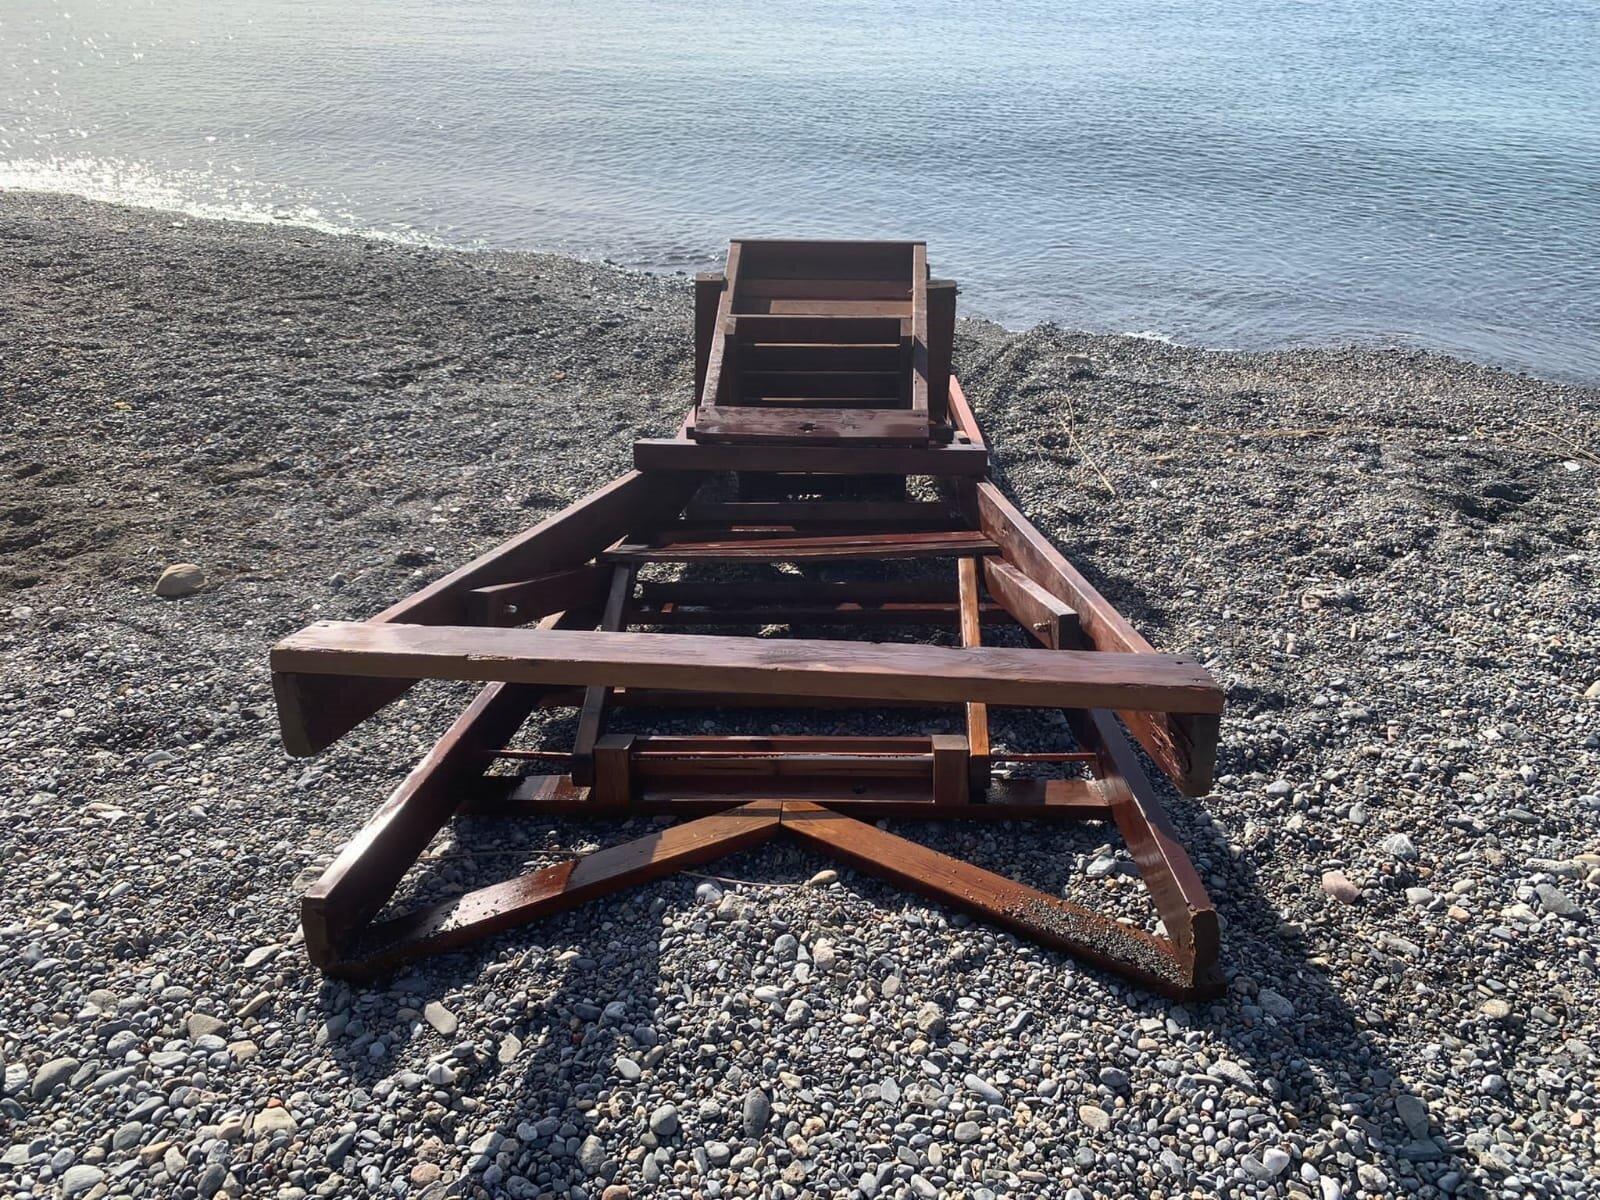 Roban parte de la malla antimedusas de la costa de Ceuta